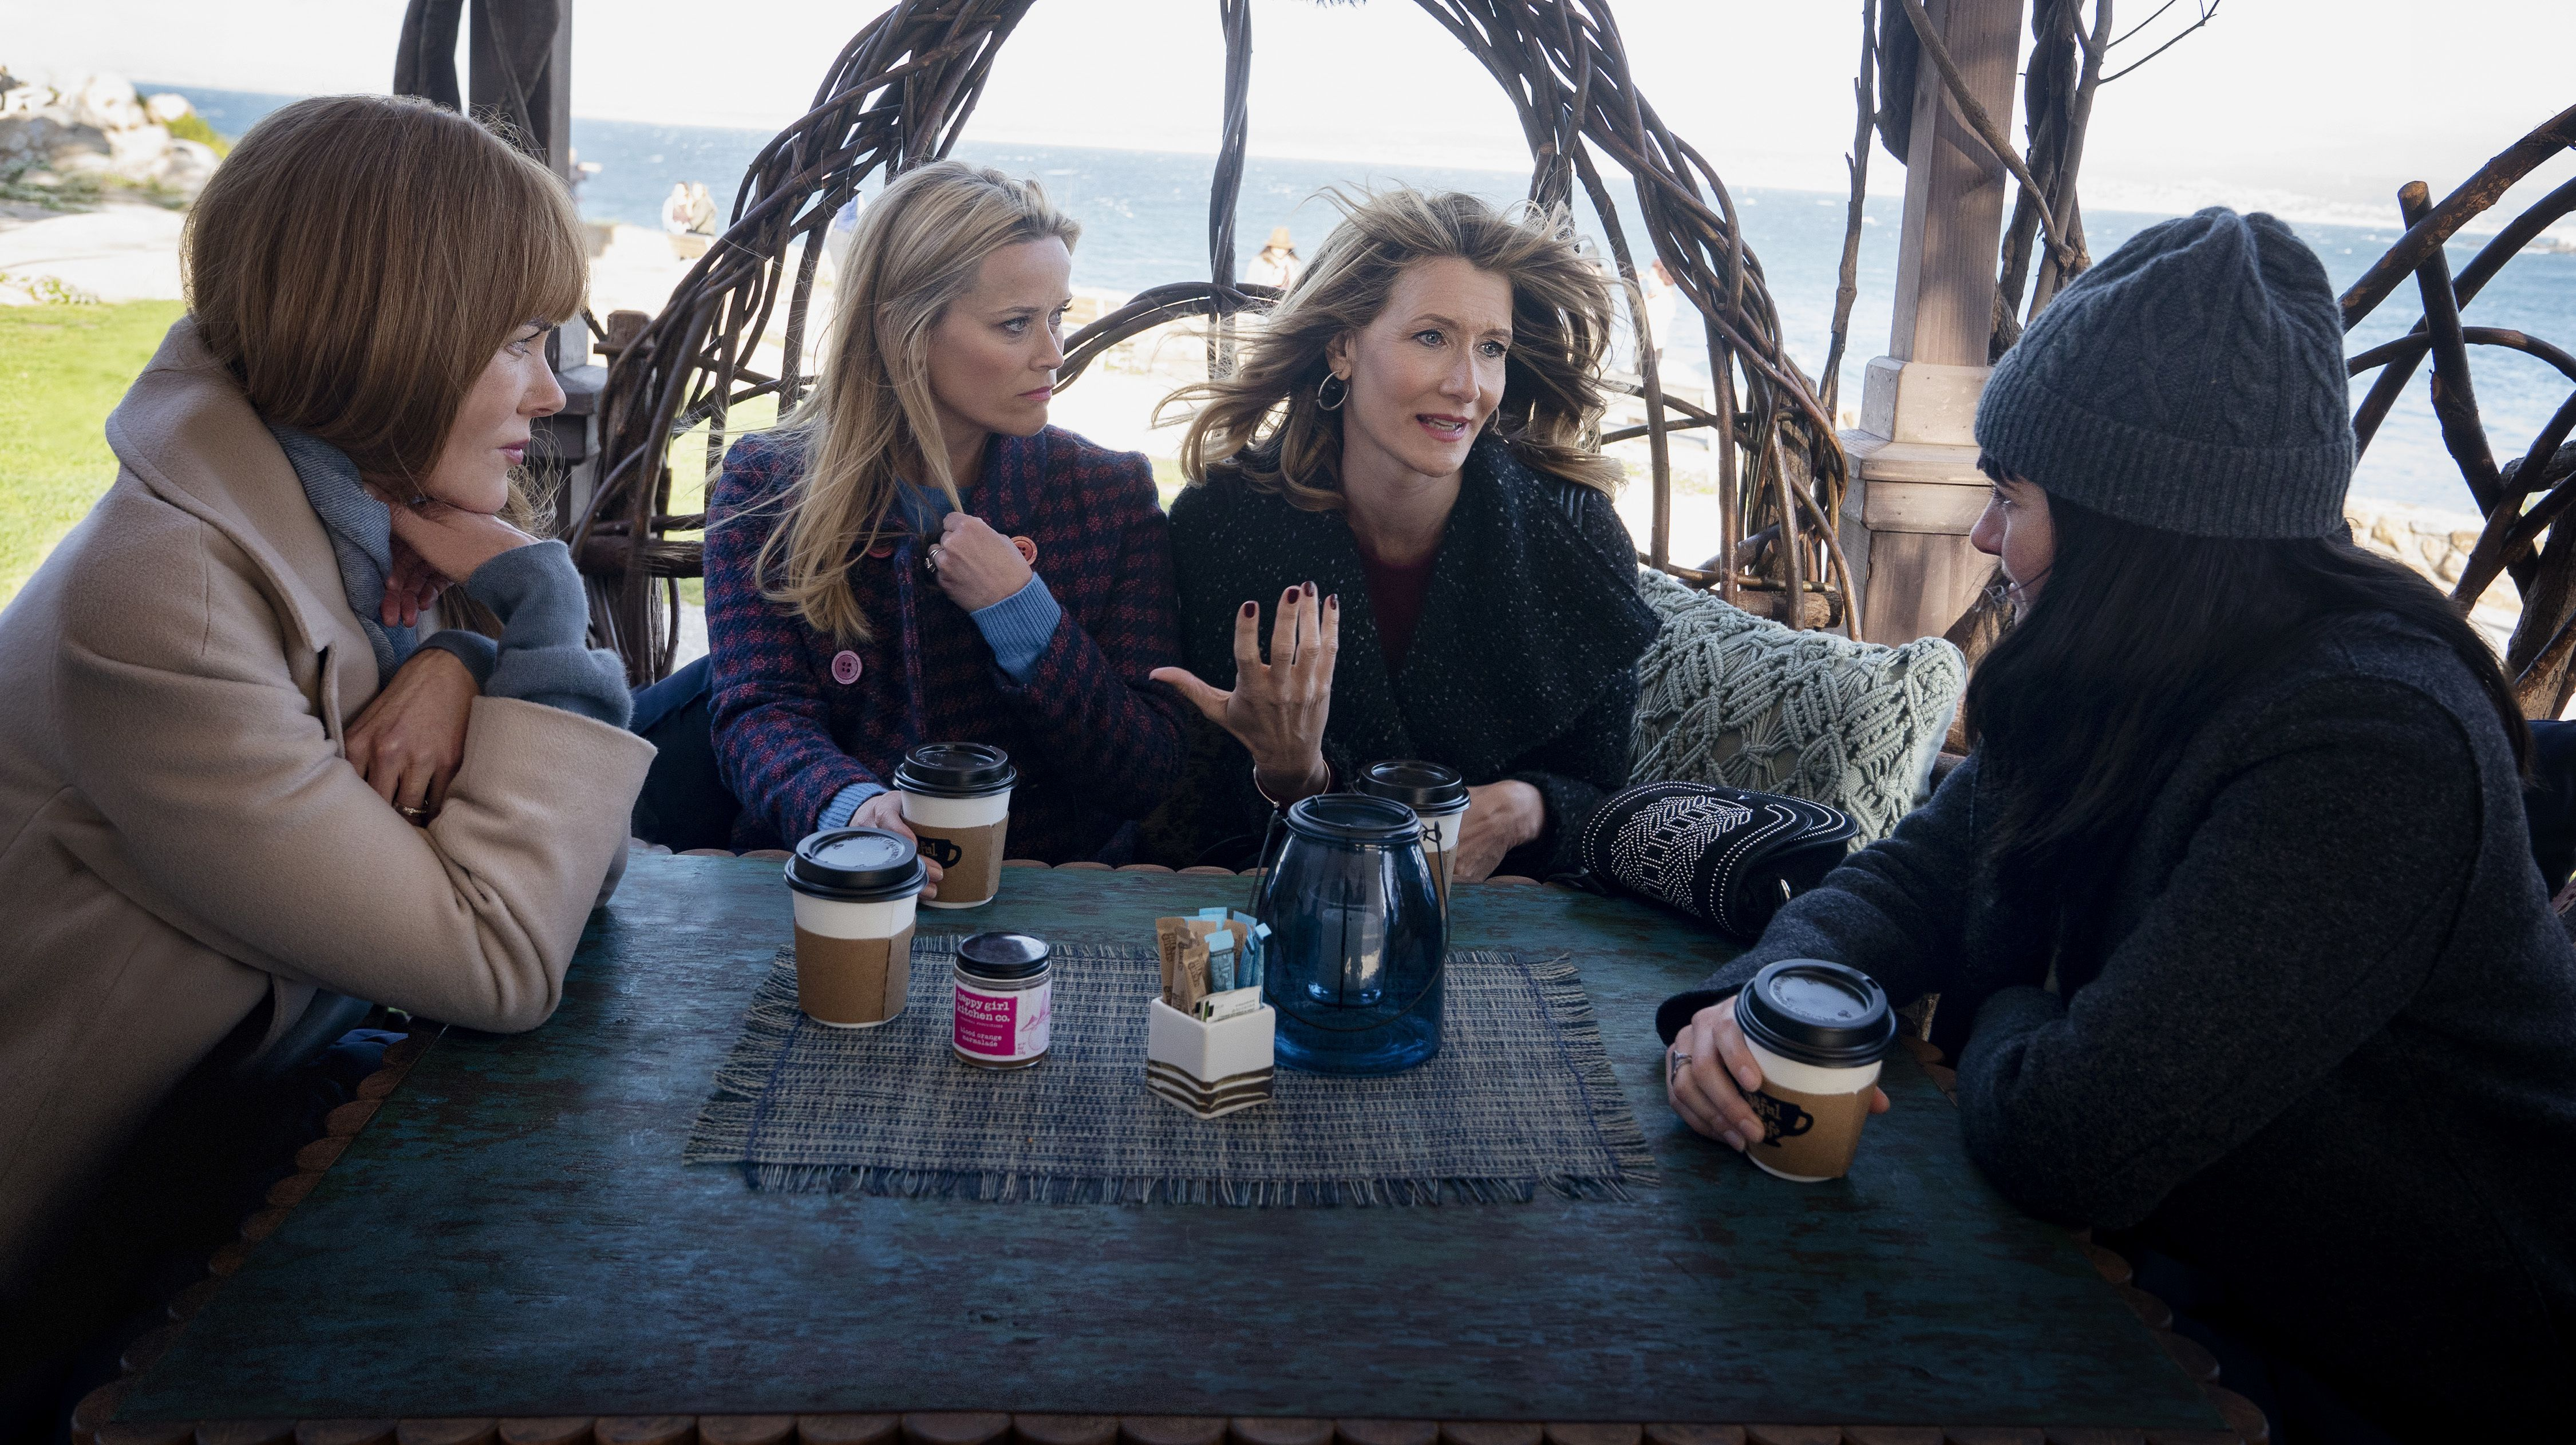 Big Little Lies' Season 2 News, Premiere Date & Cast